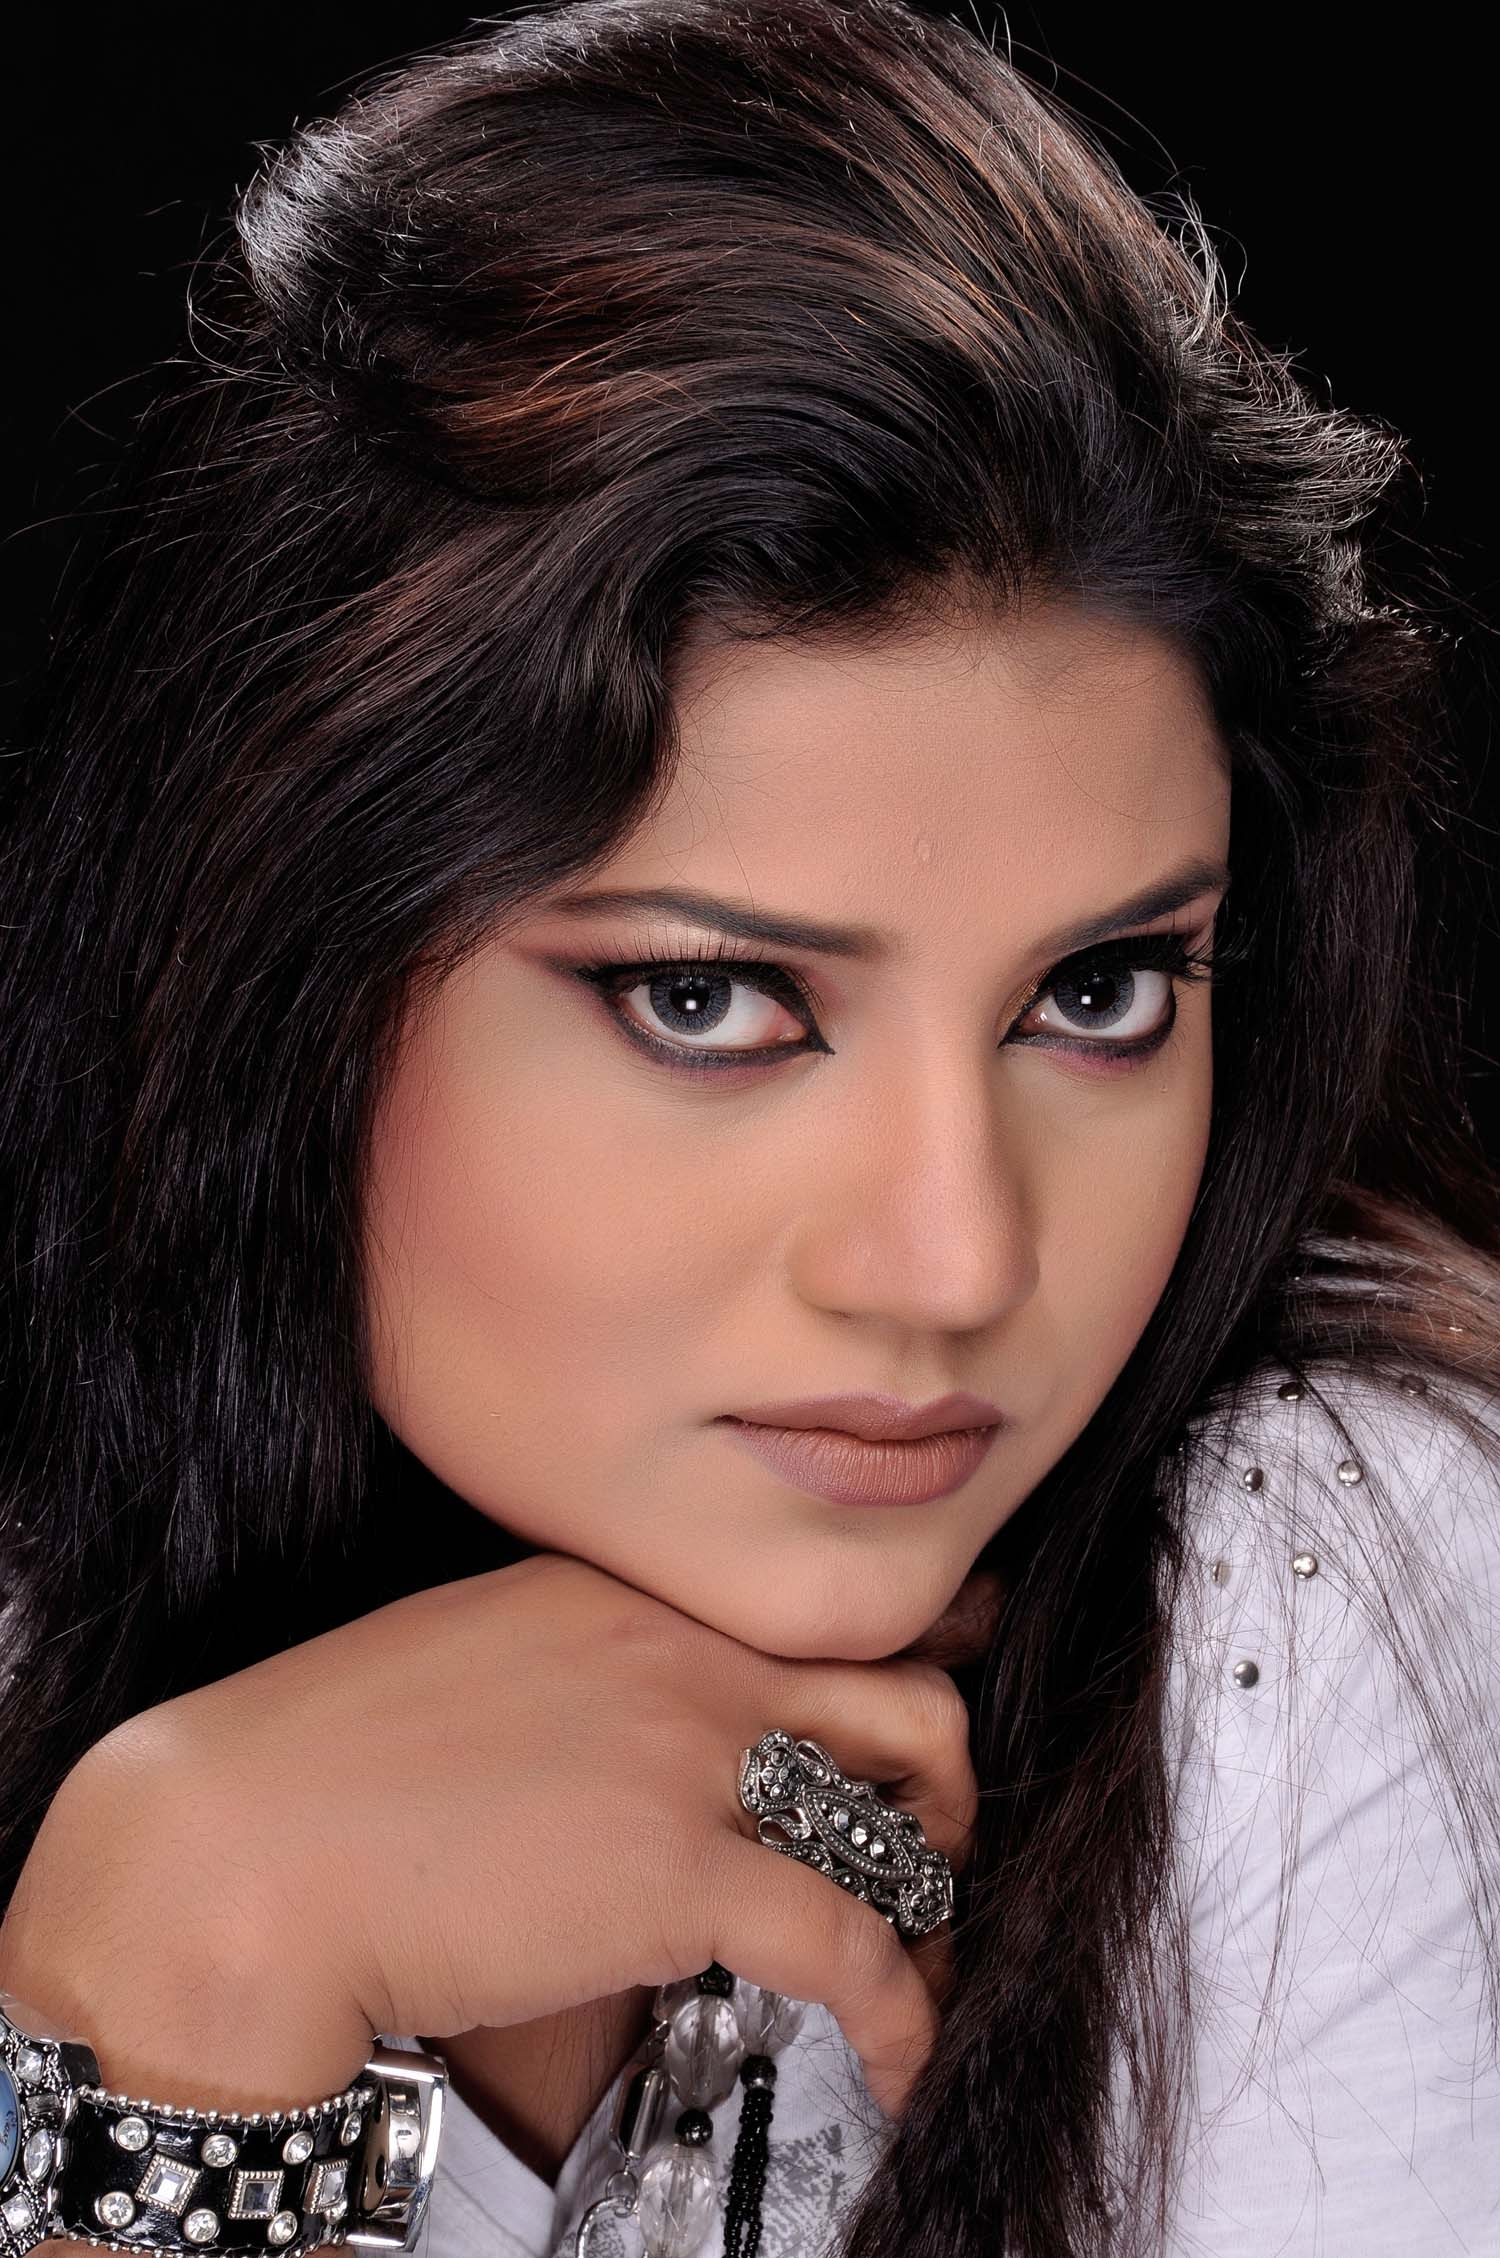 Sanya Sabrin's solo album released